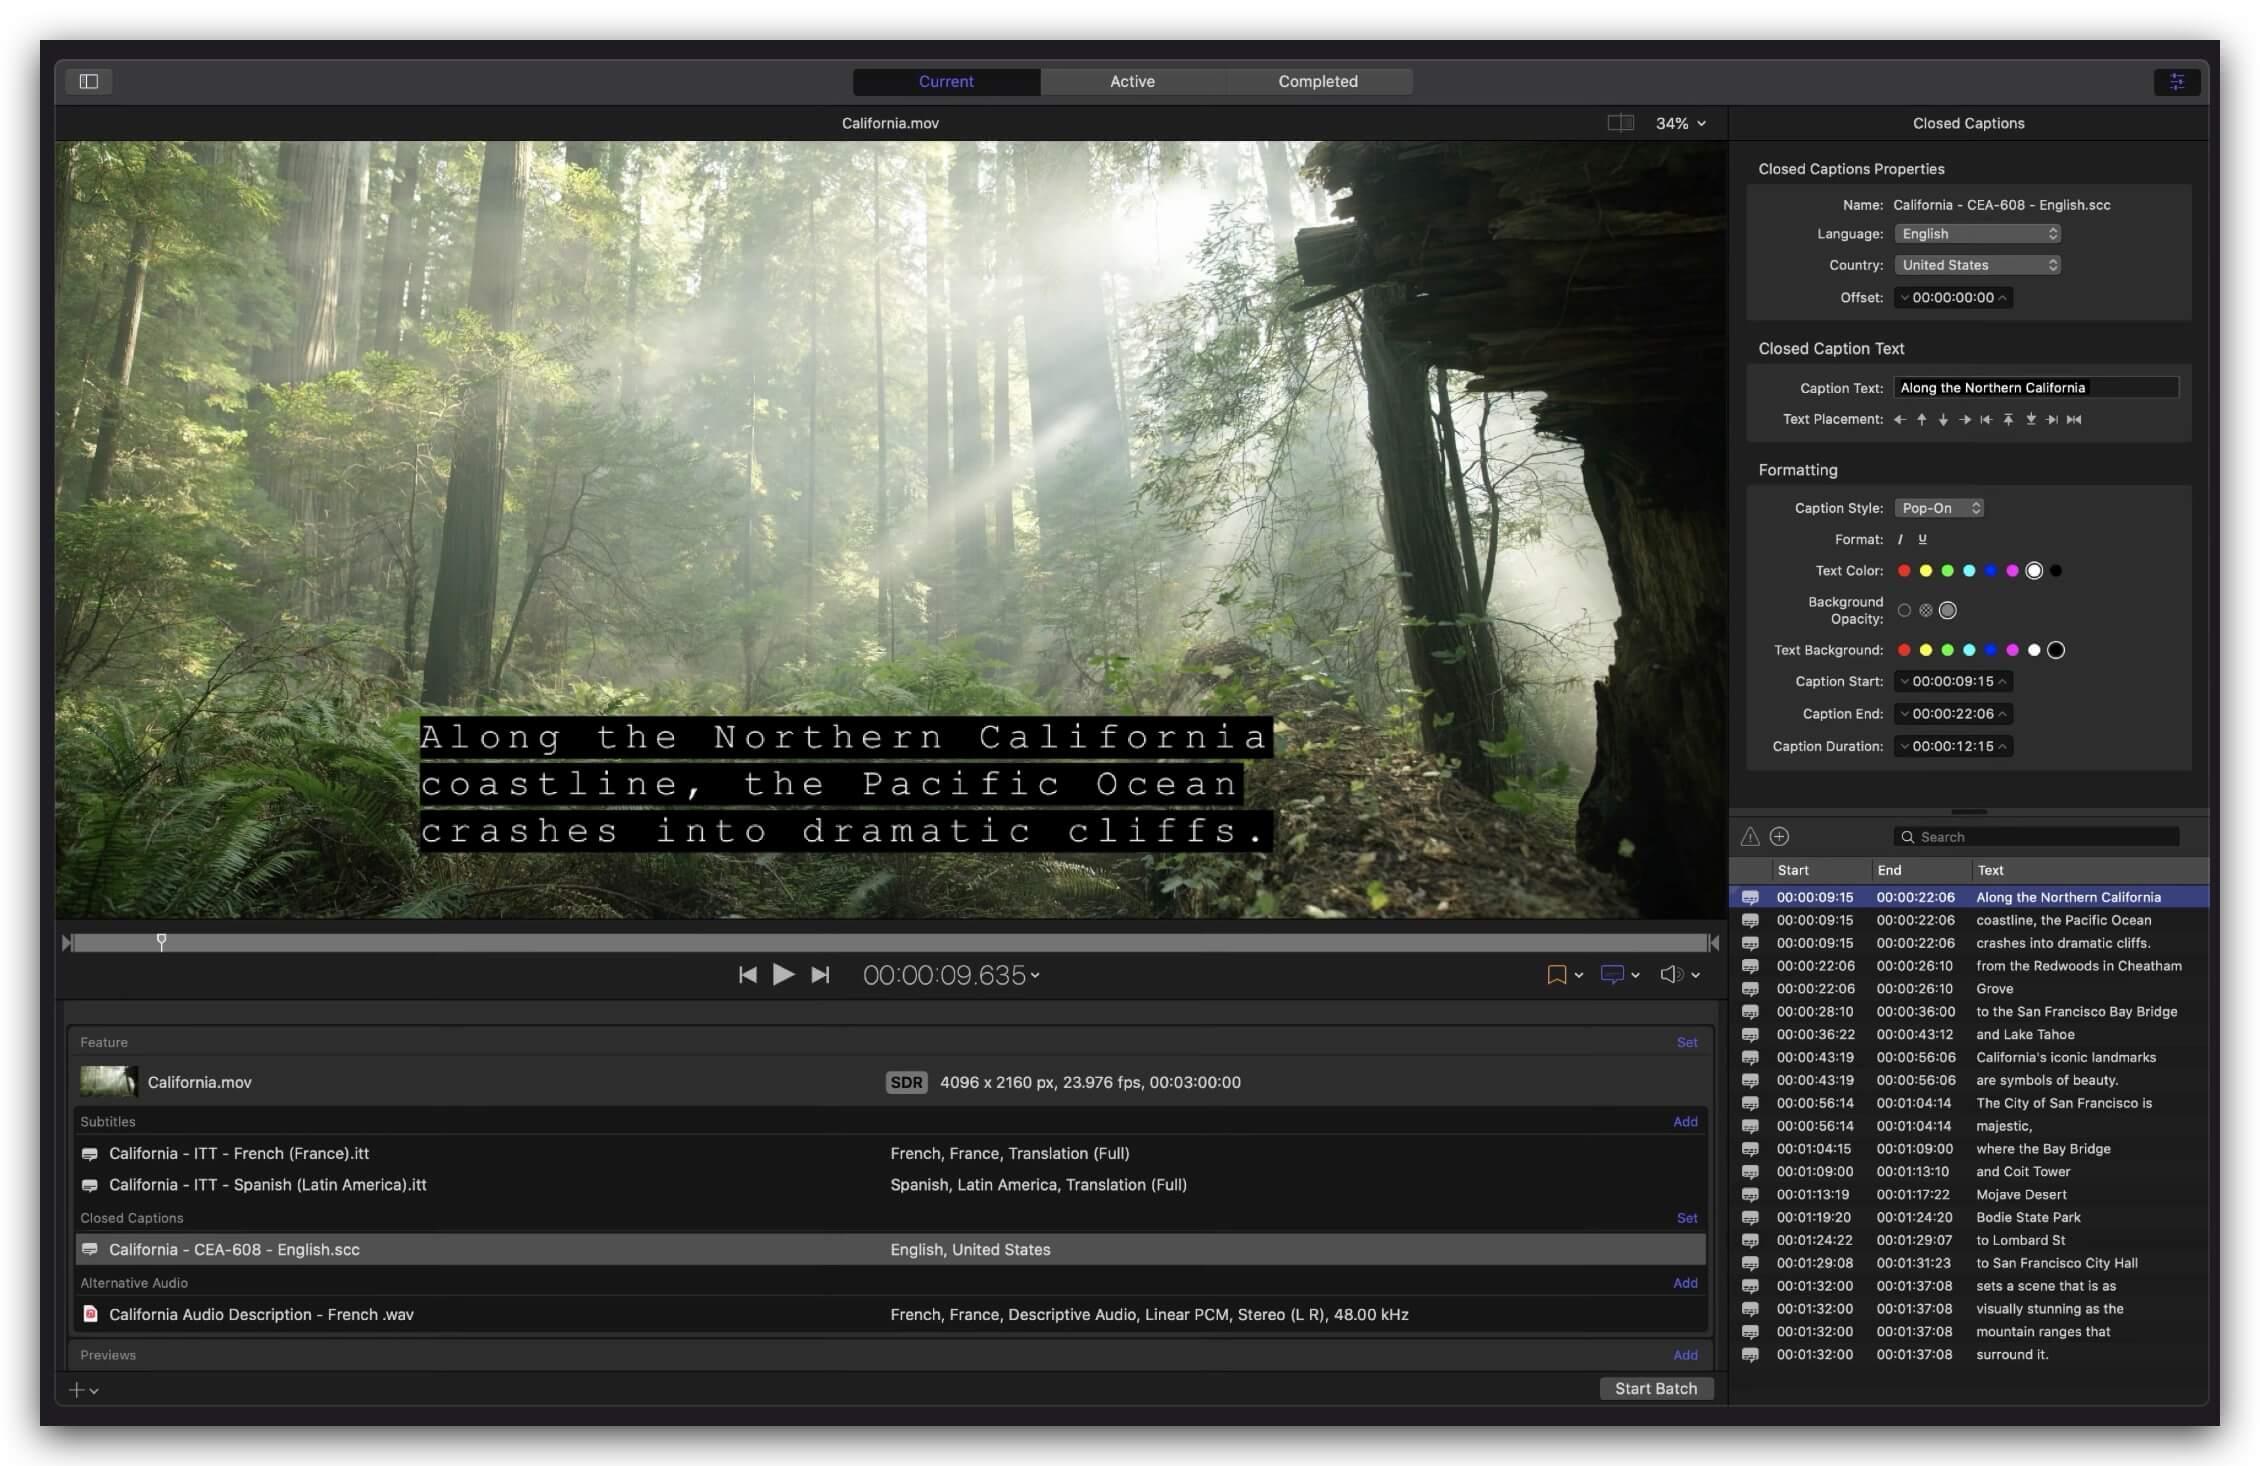 Apple Compressor 4.5 免费下载 中英文版 苹果视频压缩编码转码输出软件